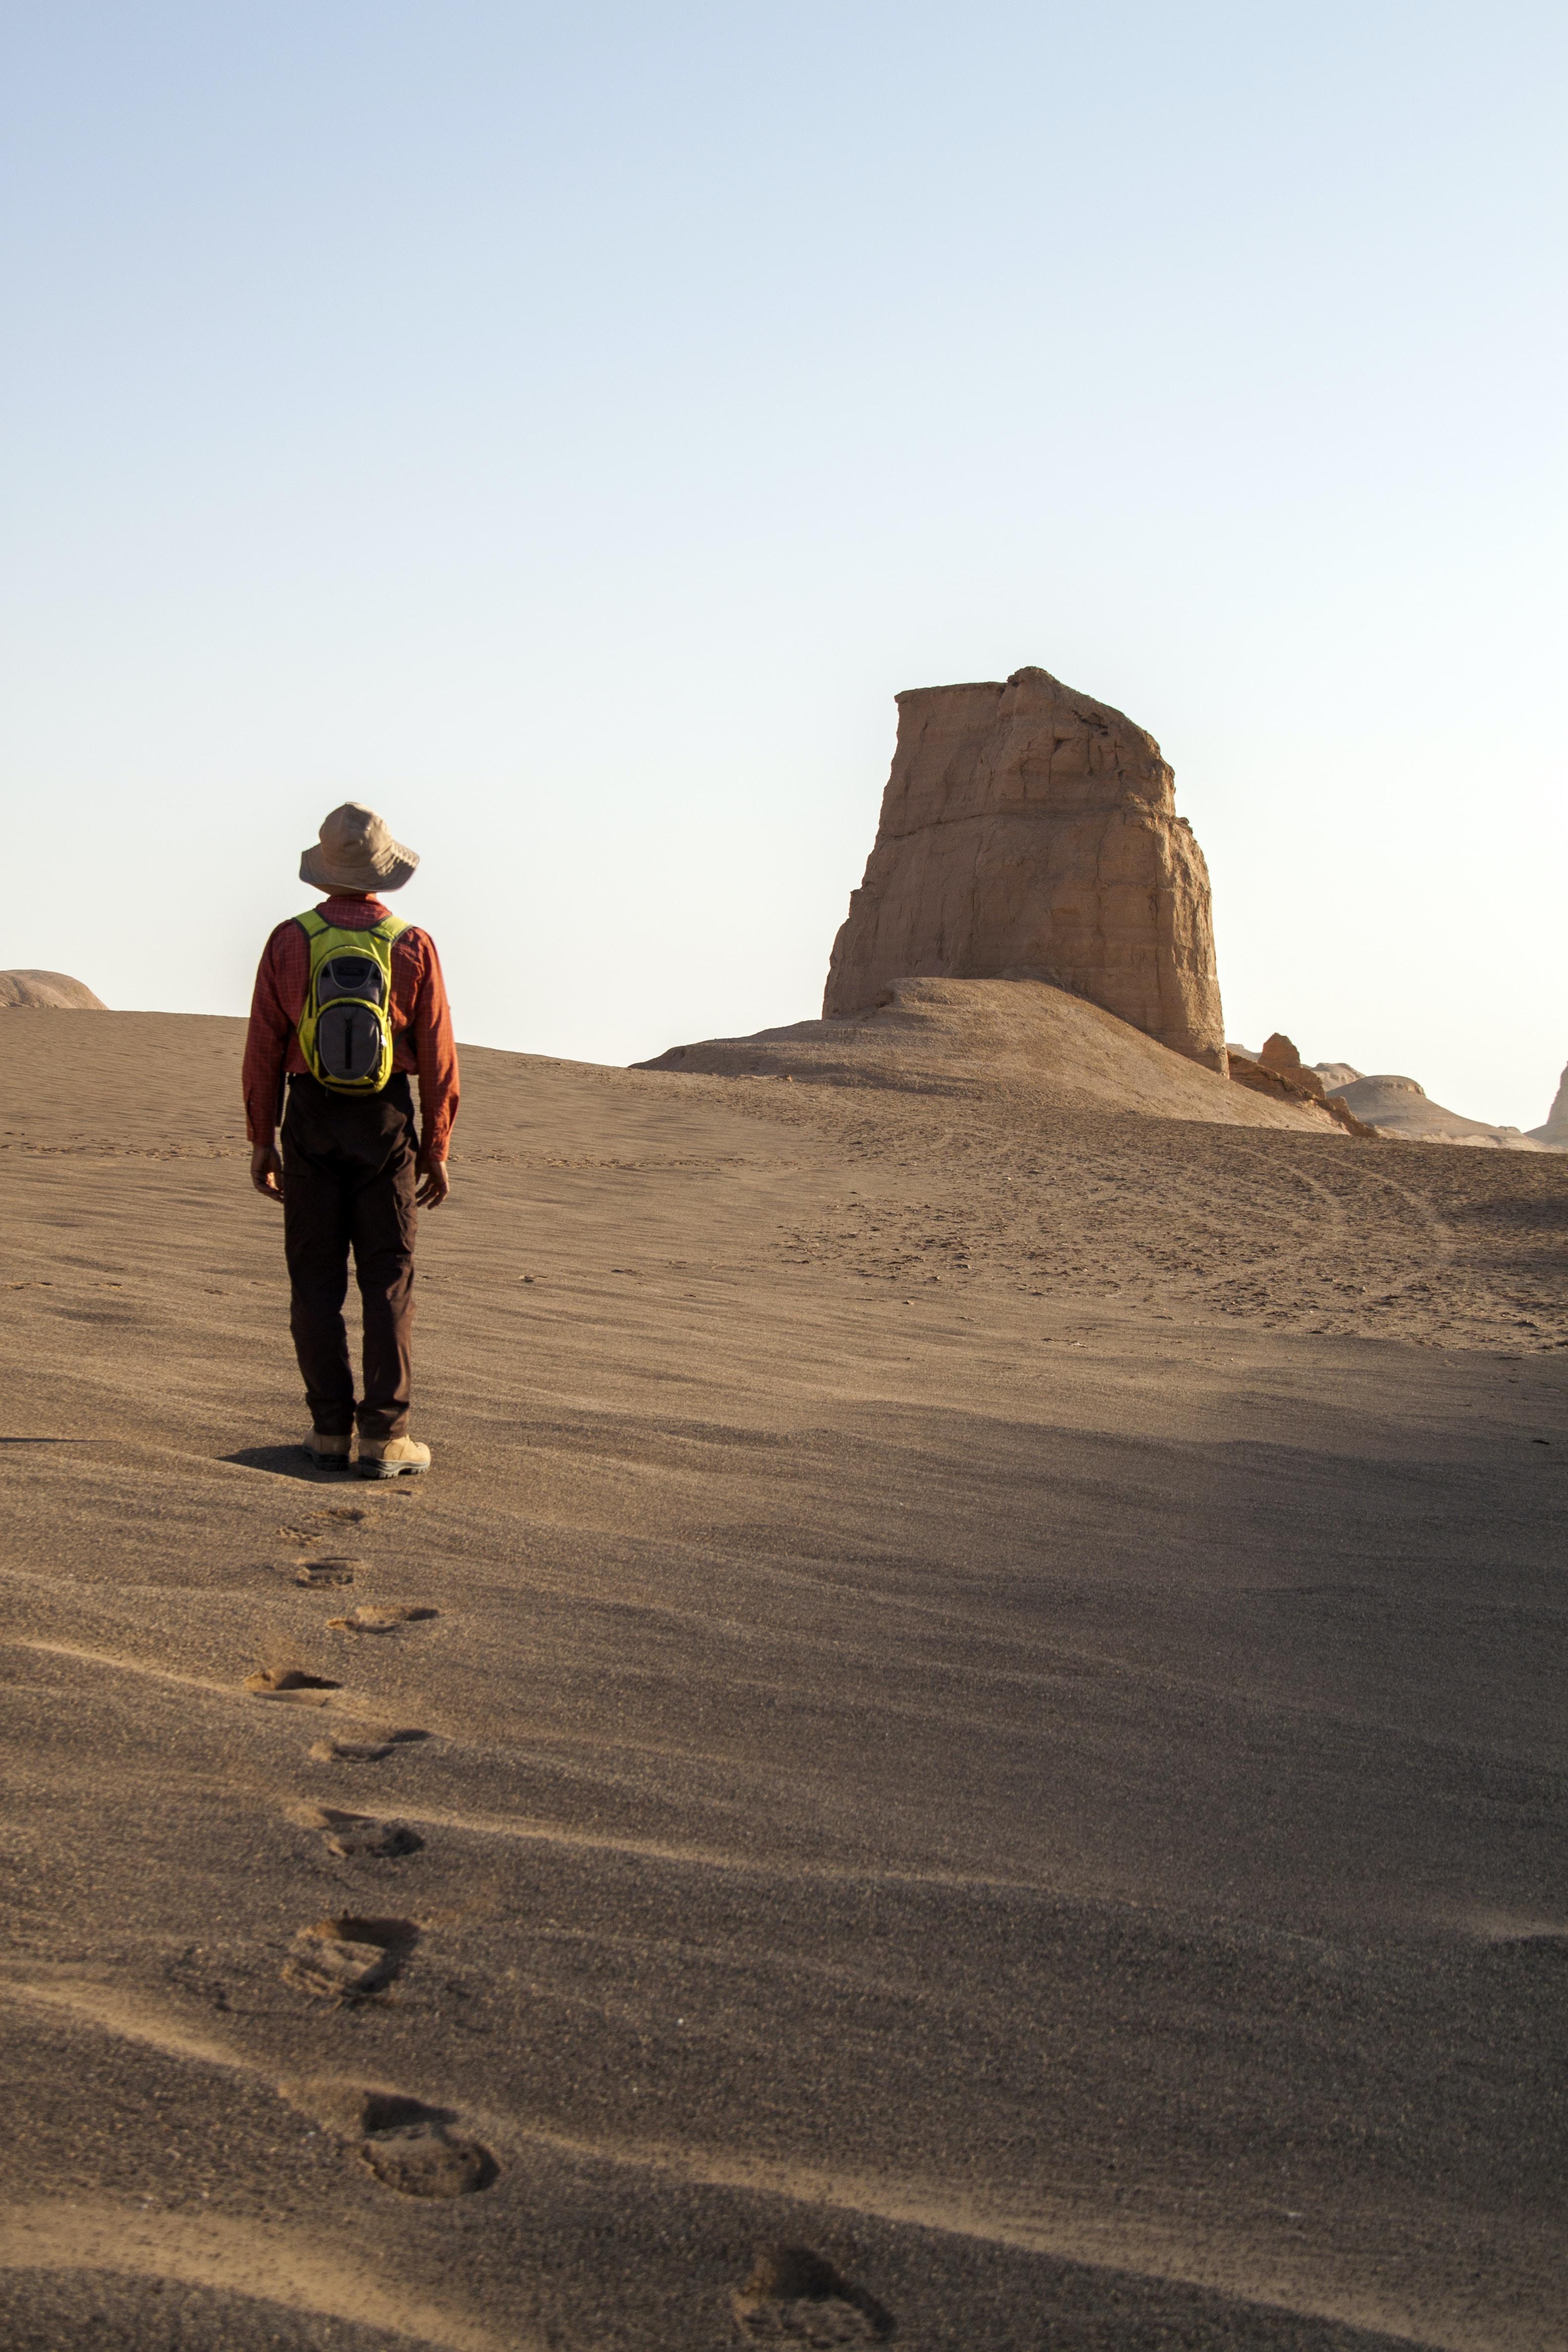 Hiker walks alone through the dry sands of shahdad desert